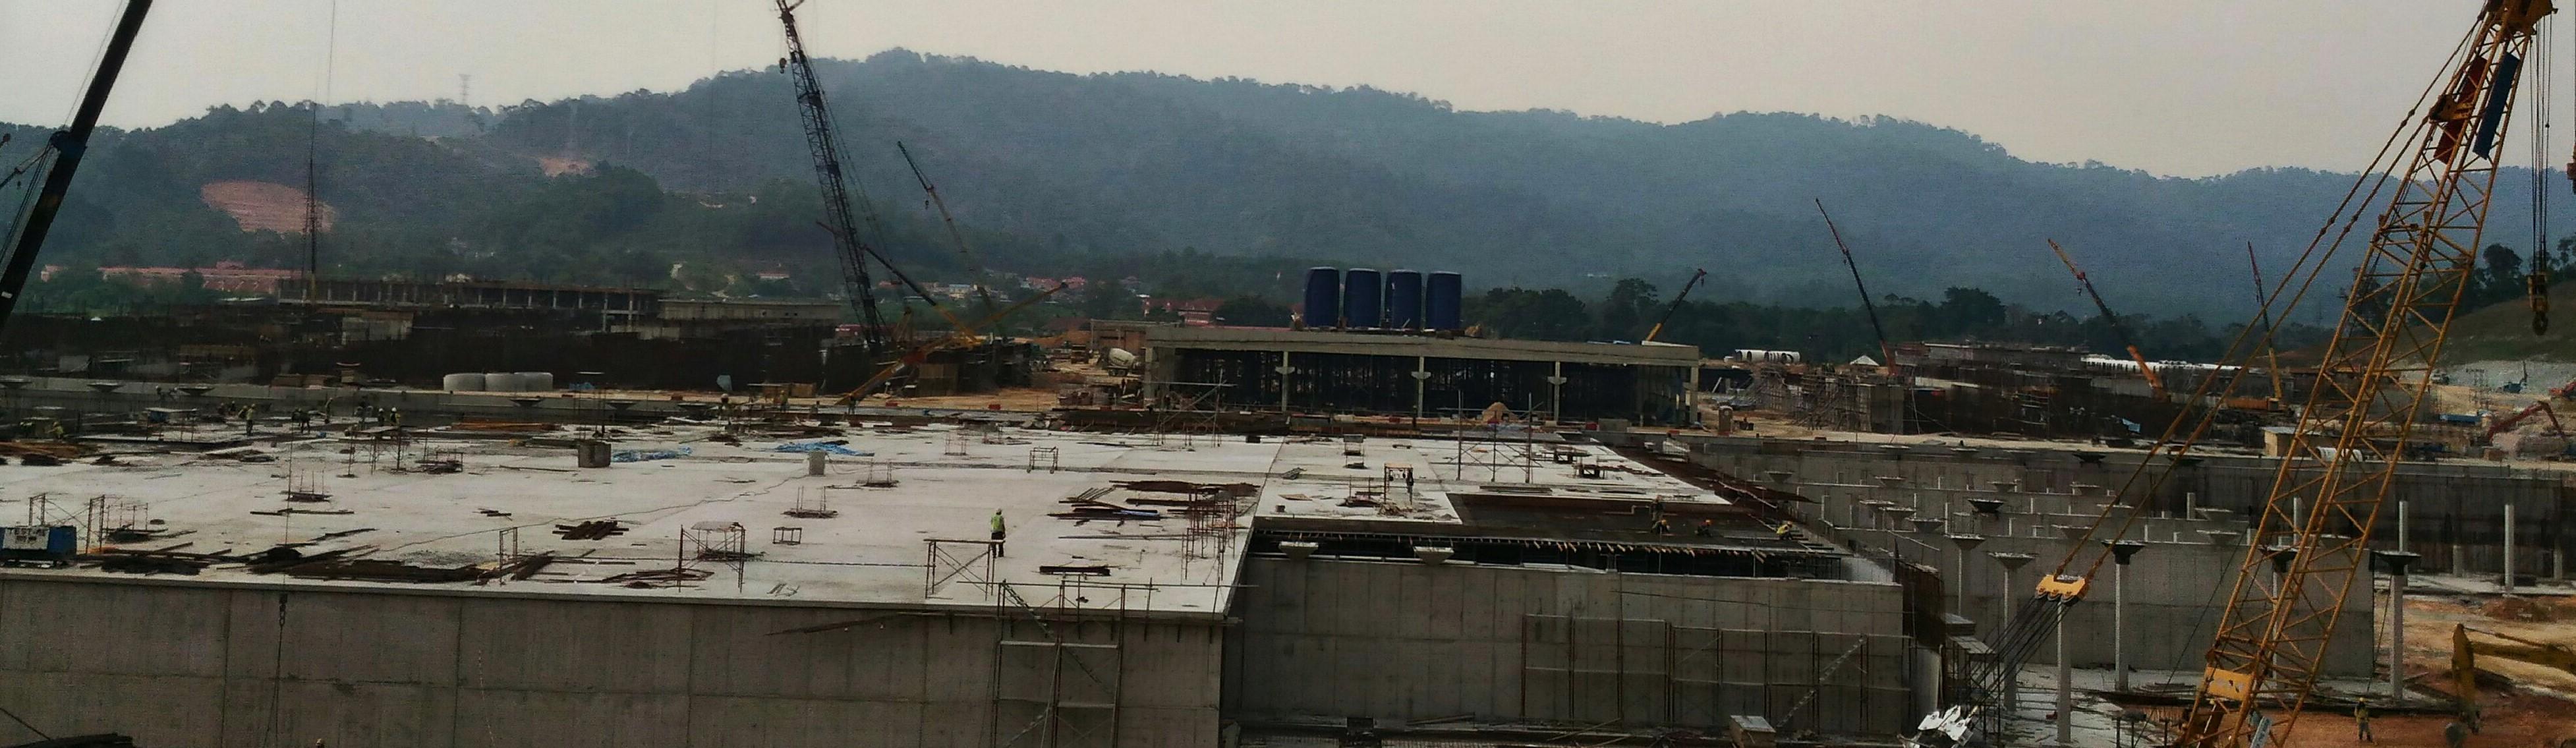 Langat 2 Water Treatment Plant, Selangor